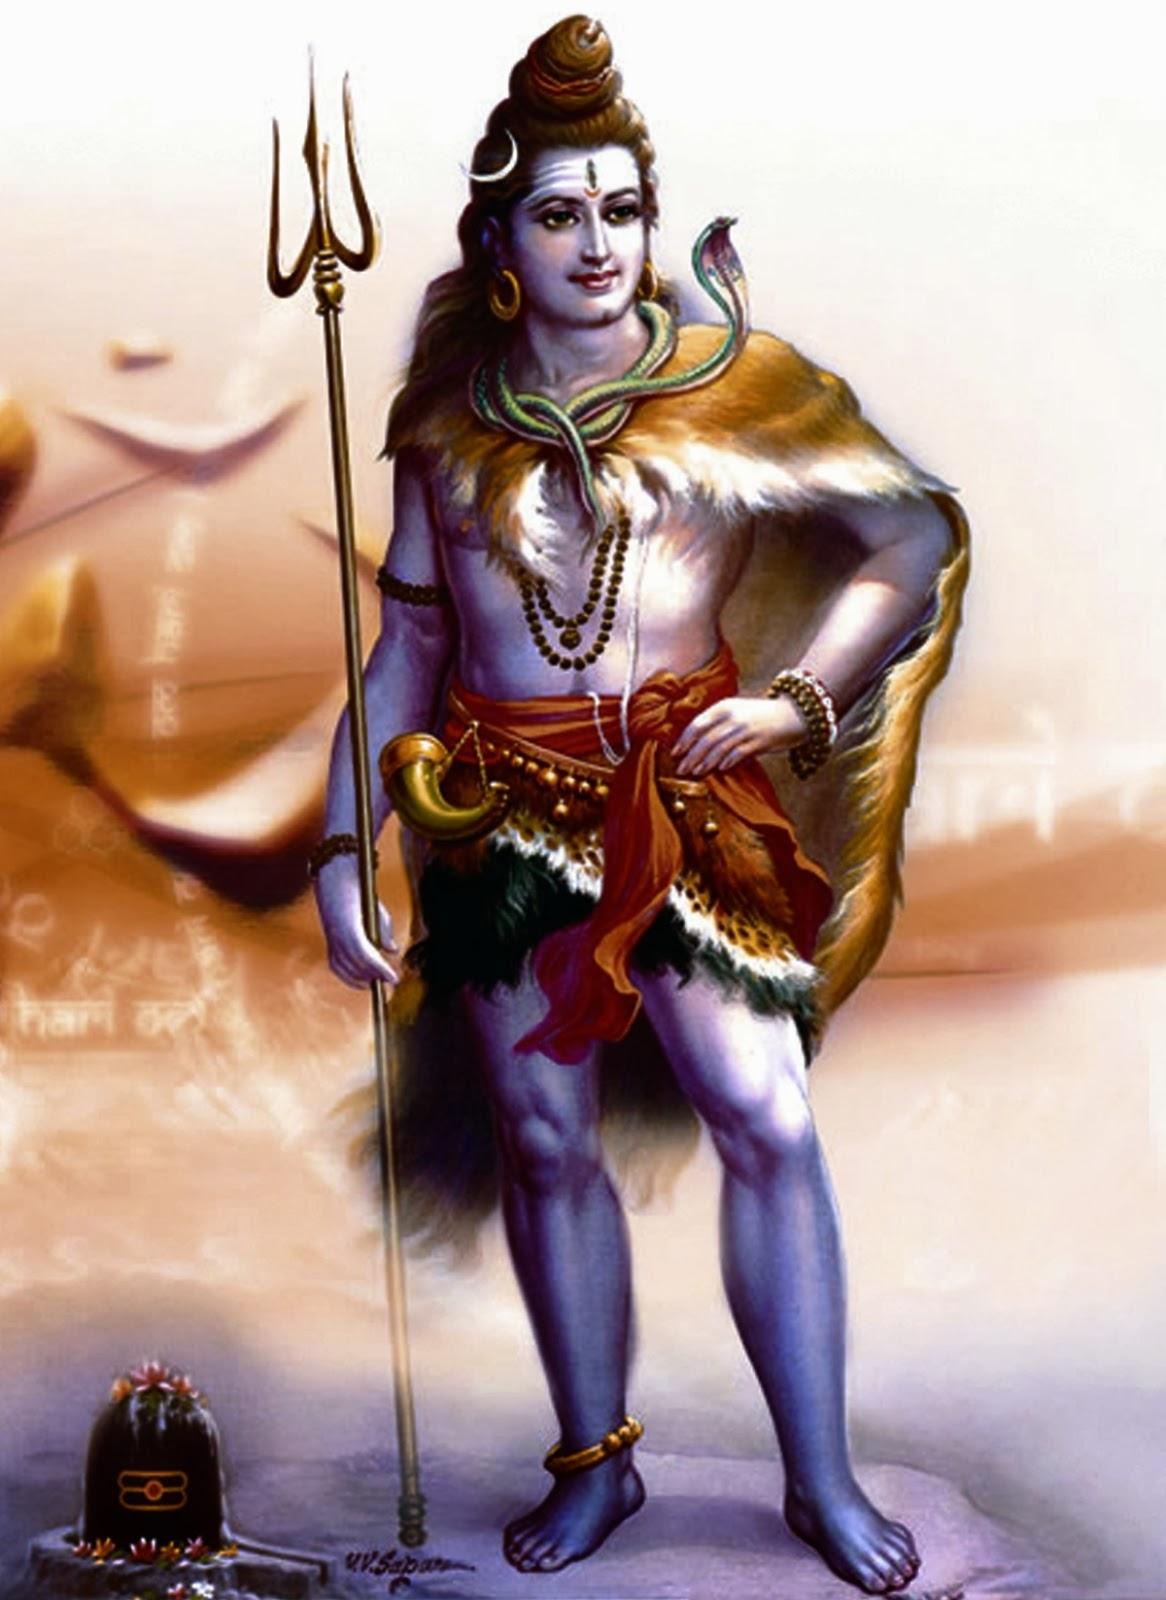 LORD SHIVA: Shiva Linga: The Symbol for Shiva